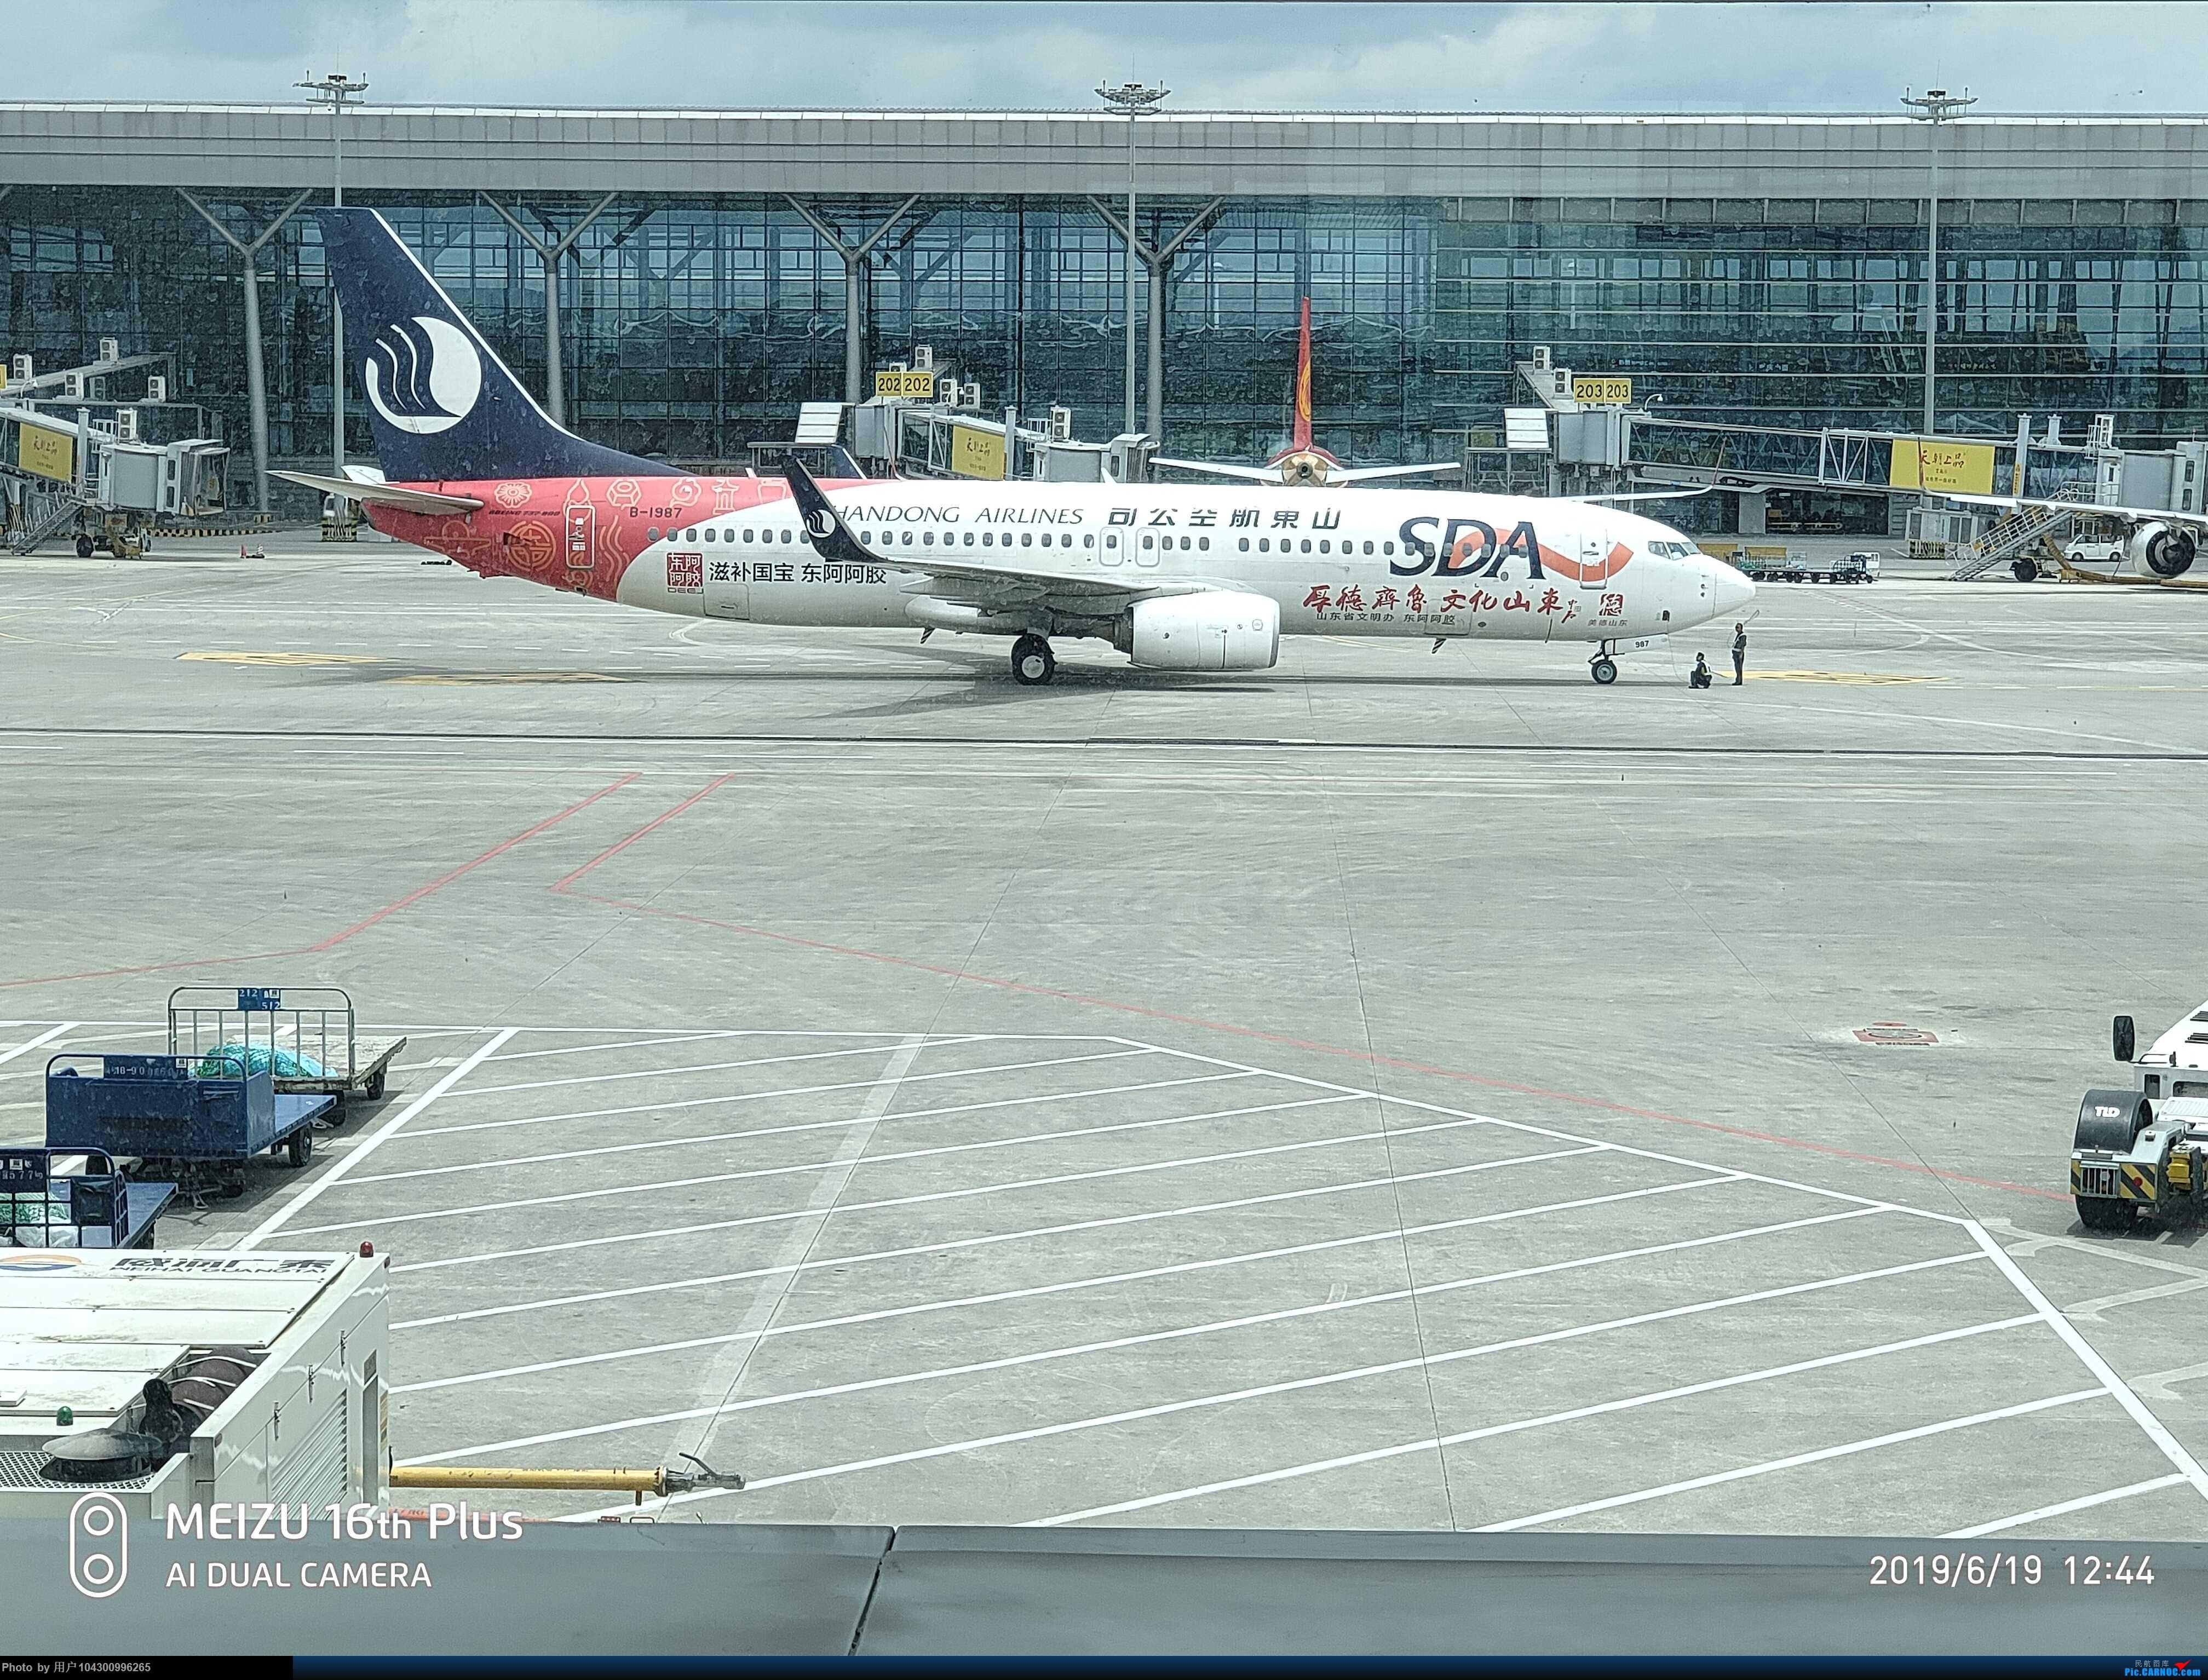 Re:[原创]DM哥飞行游记--贵阳往返荔波2日游 BOEING 737-800 B-1987 中国贵阳龙洞堡国际机场